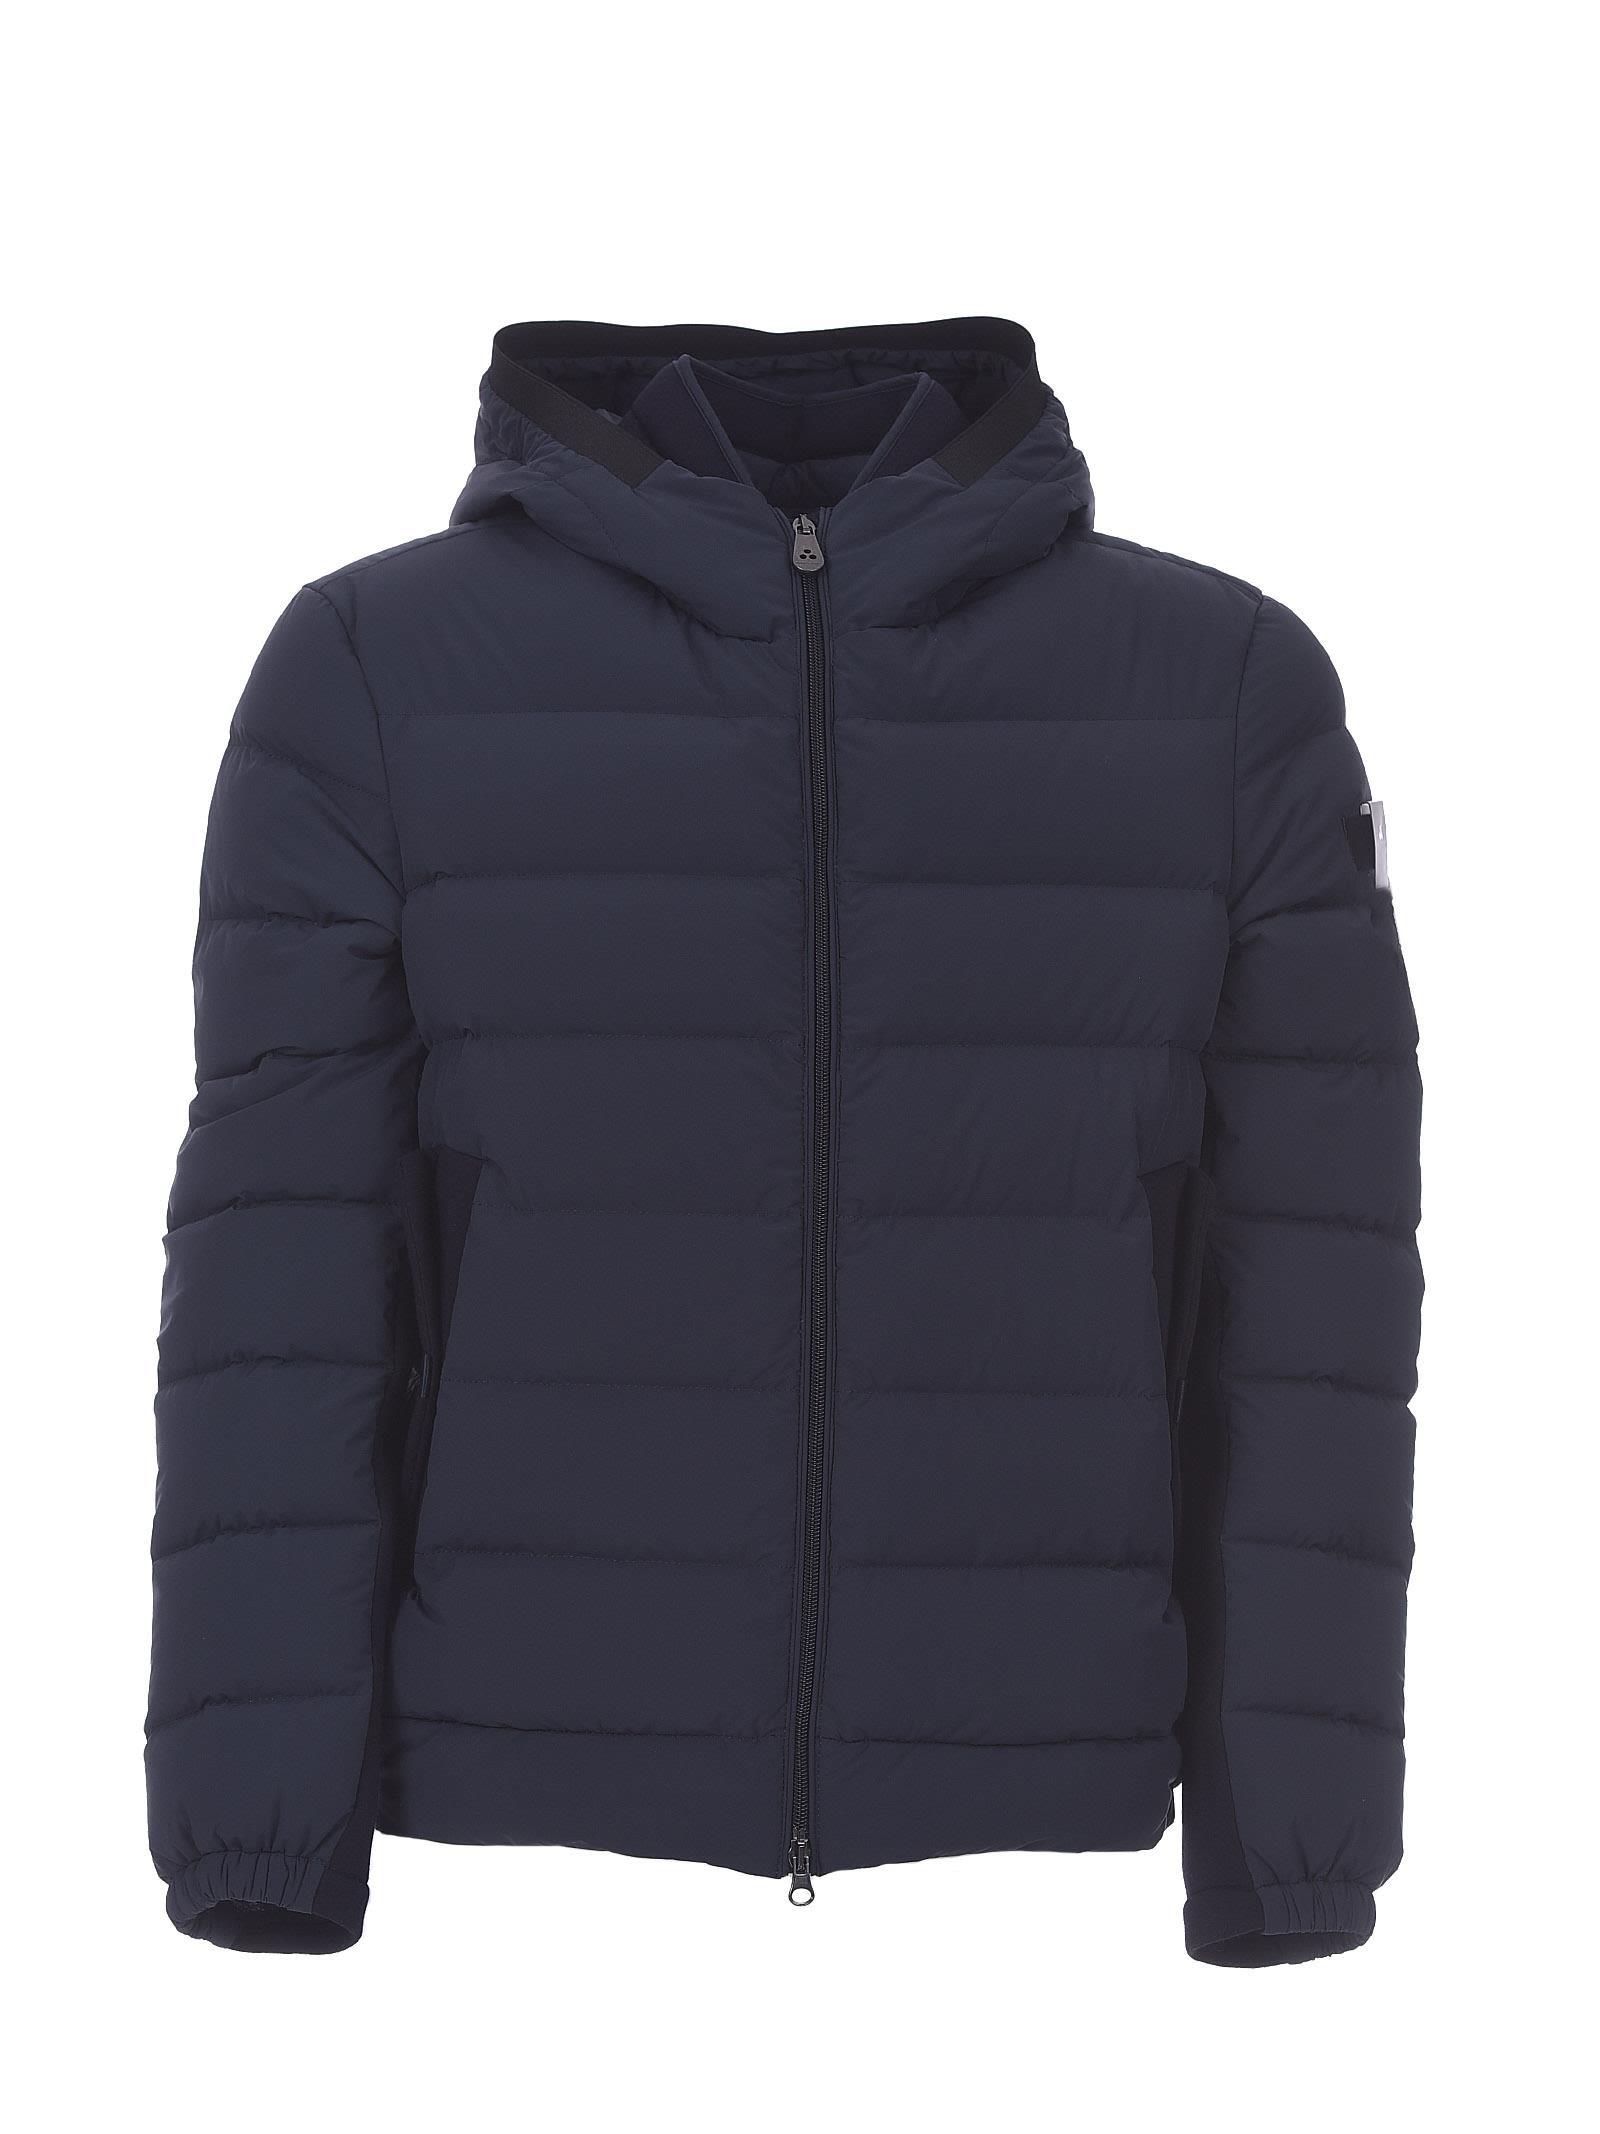 Peuterey Down Jacket Kenobi Ag Mat 01